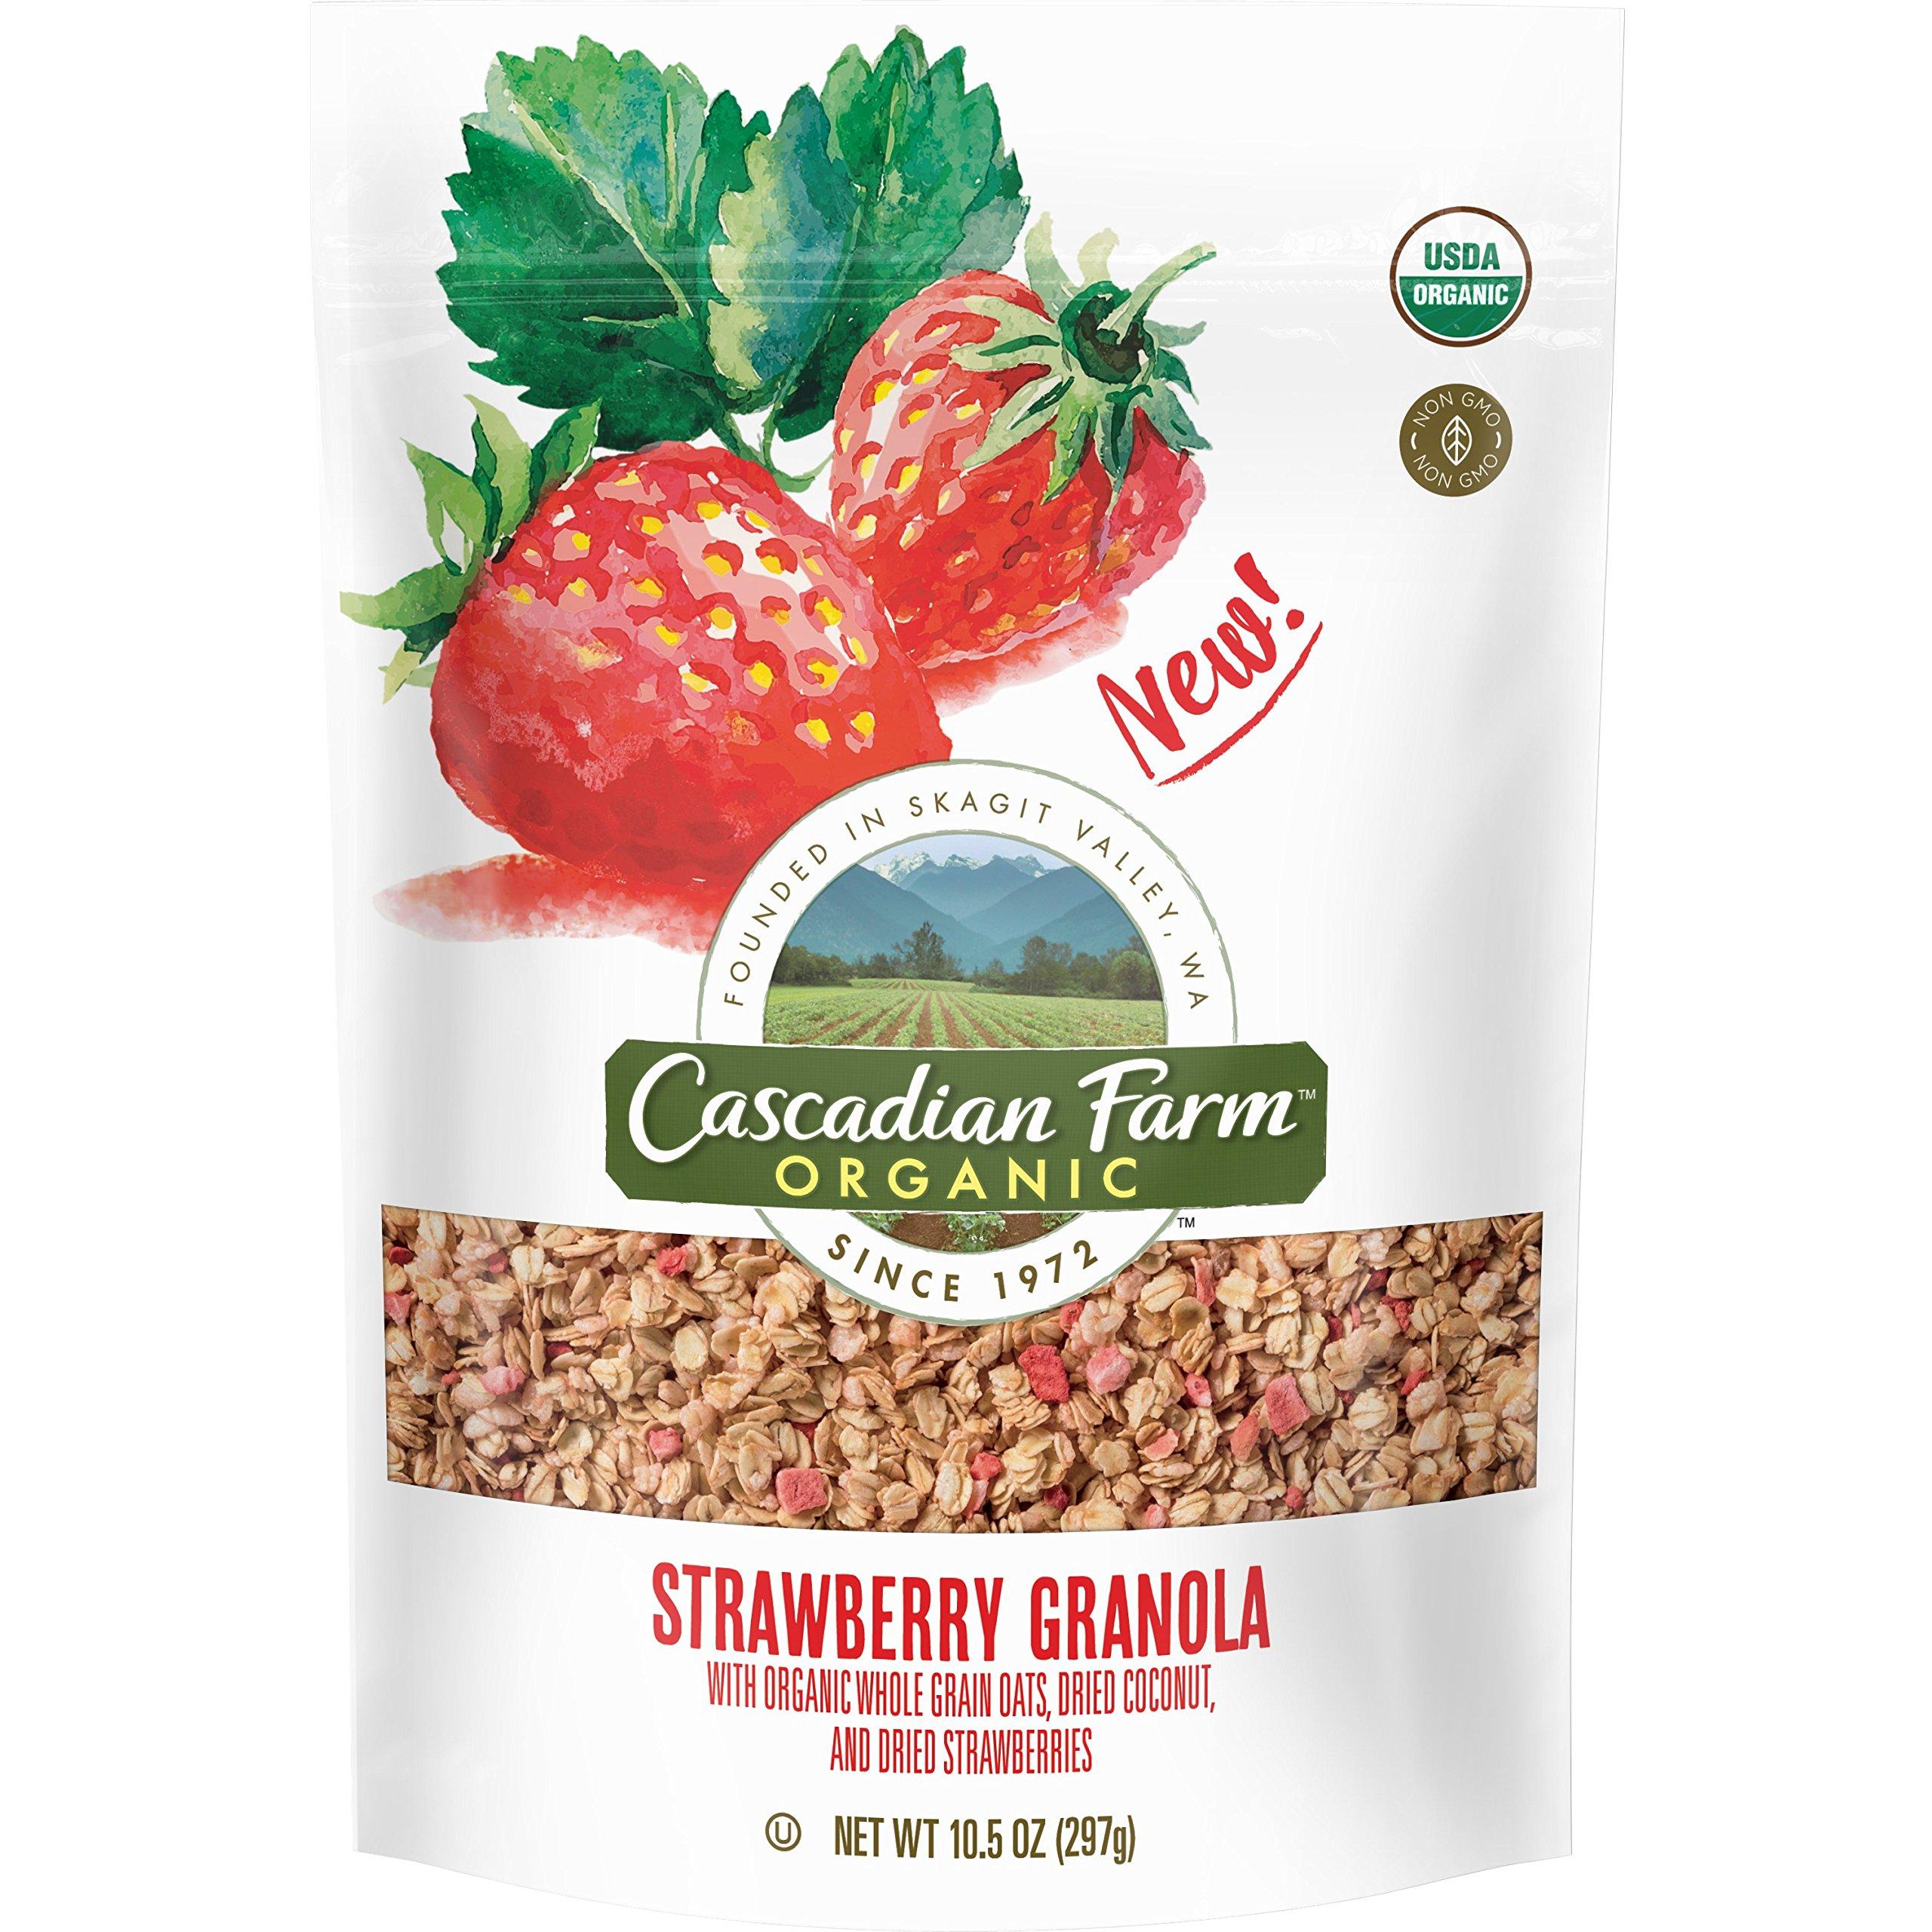 Amazon.com: Cascadian Farm Lemon Blueberry Granola, 11.5 Oz: